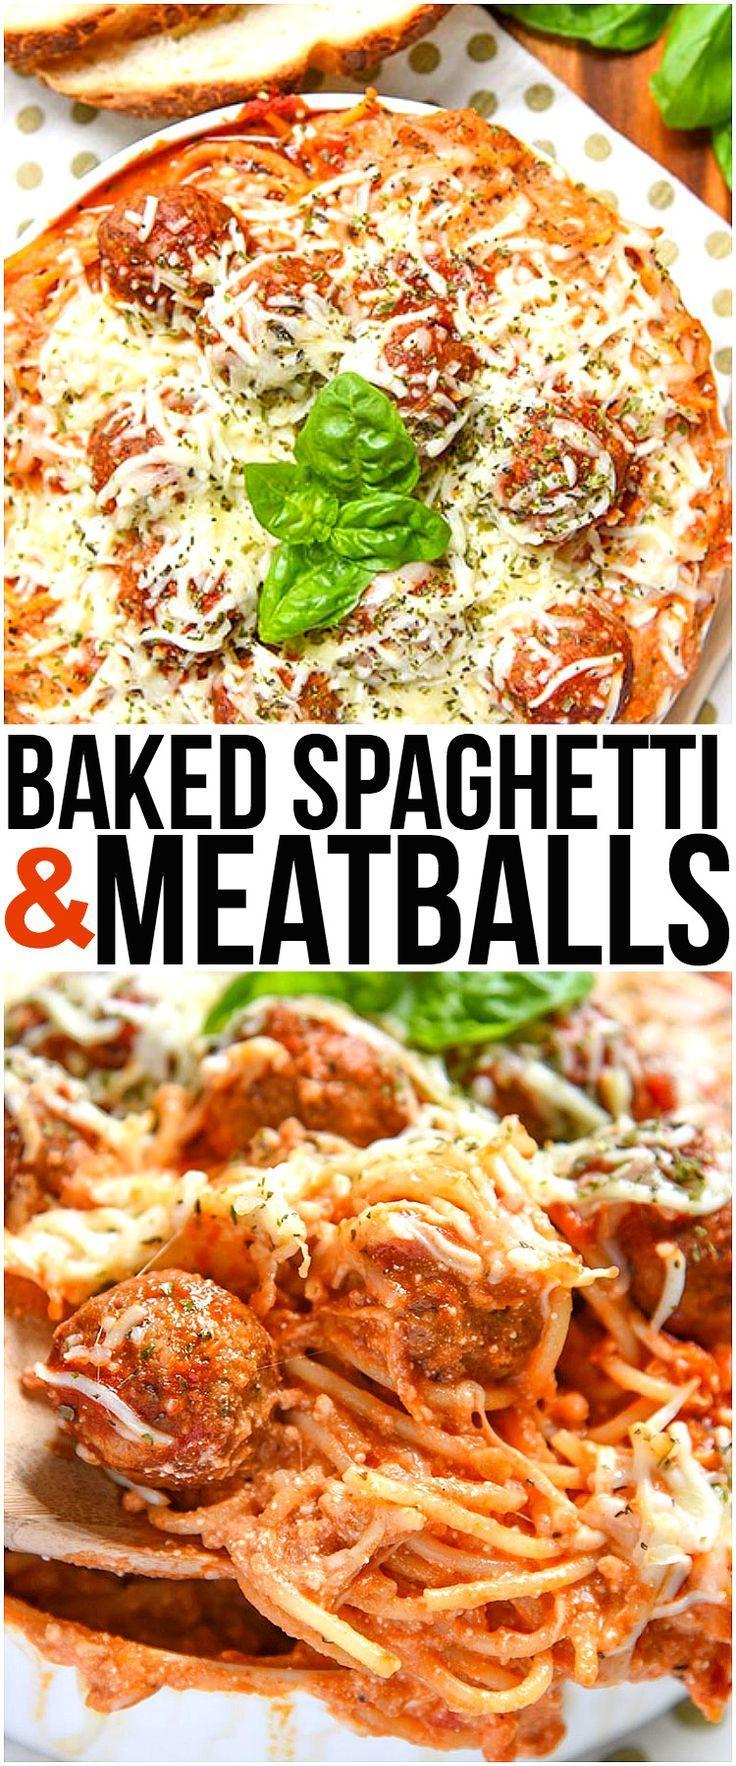 Baked Spaghetti and Meatballs is an easy dinner recipe of Italian Meatballs with Homemade Marinara Sauce, Pasta, Italian Cheese, and Spice.   via @CourtneysSweets